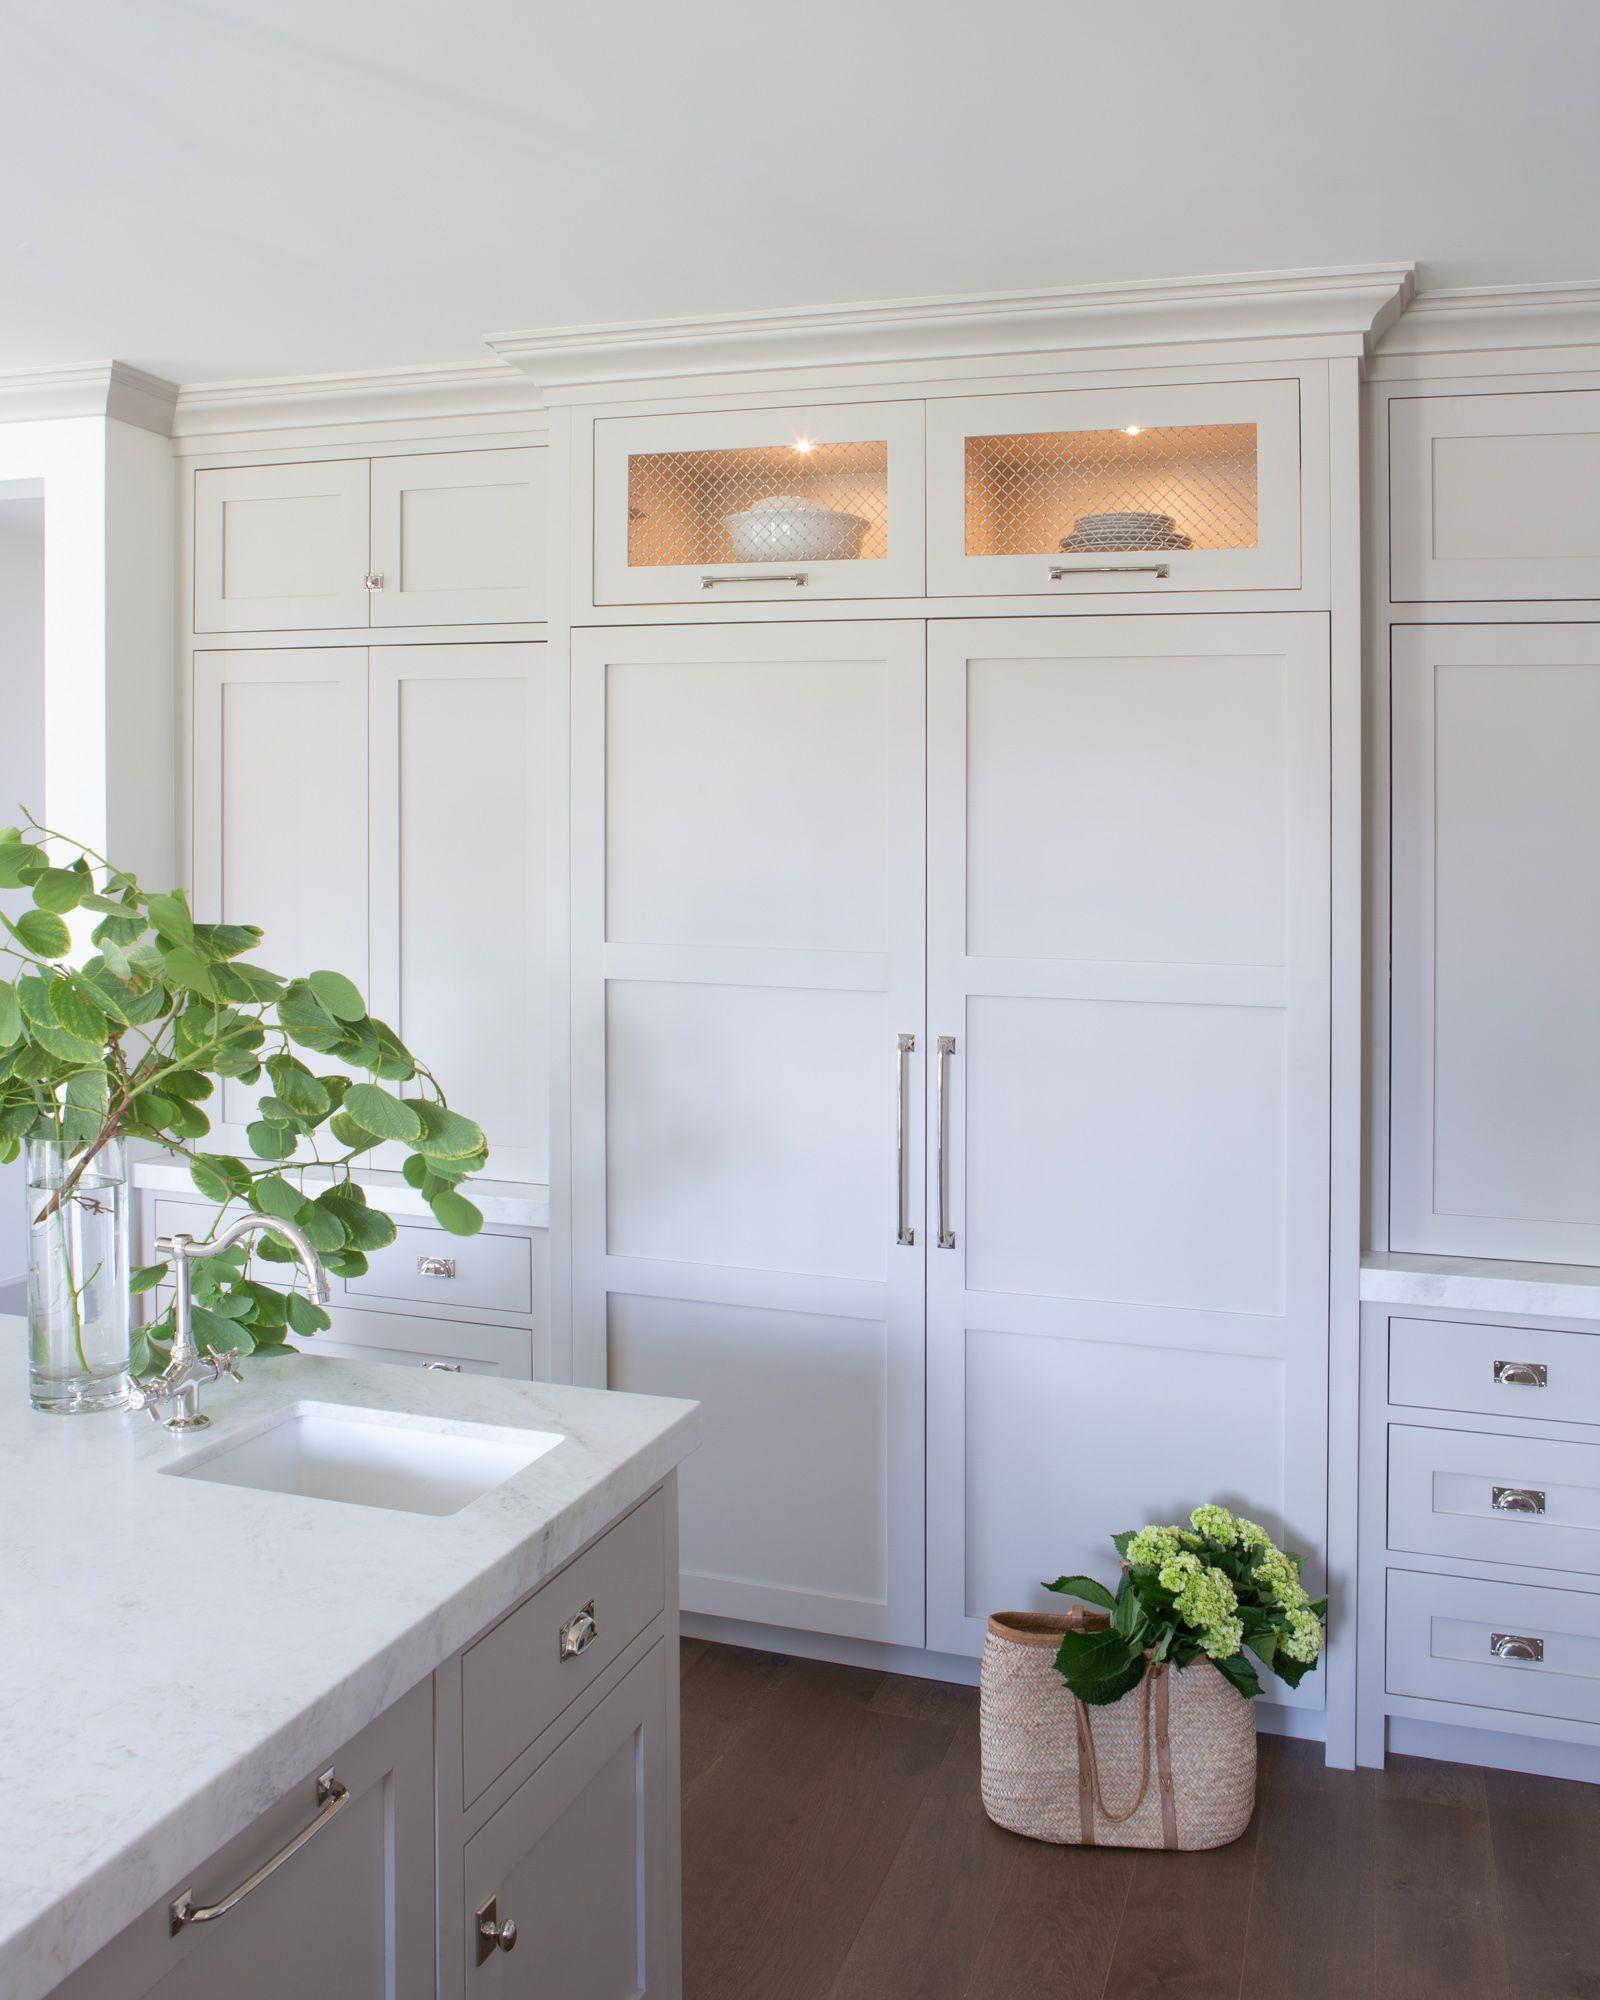 Clean English Tudor | Floor to ceiling cabinets, Kitchen remodel design, Espresso kitchen cabinets